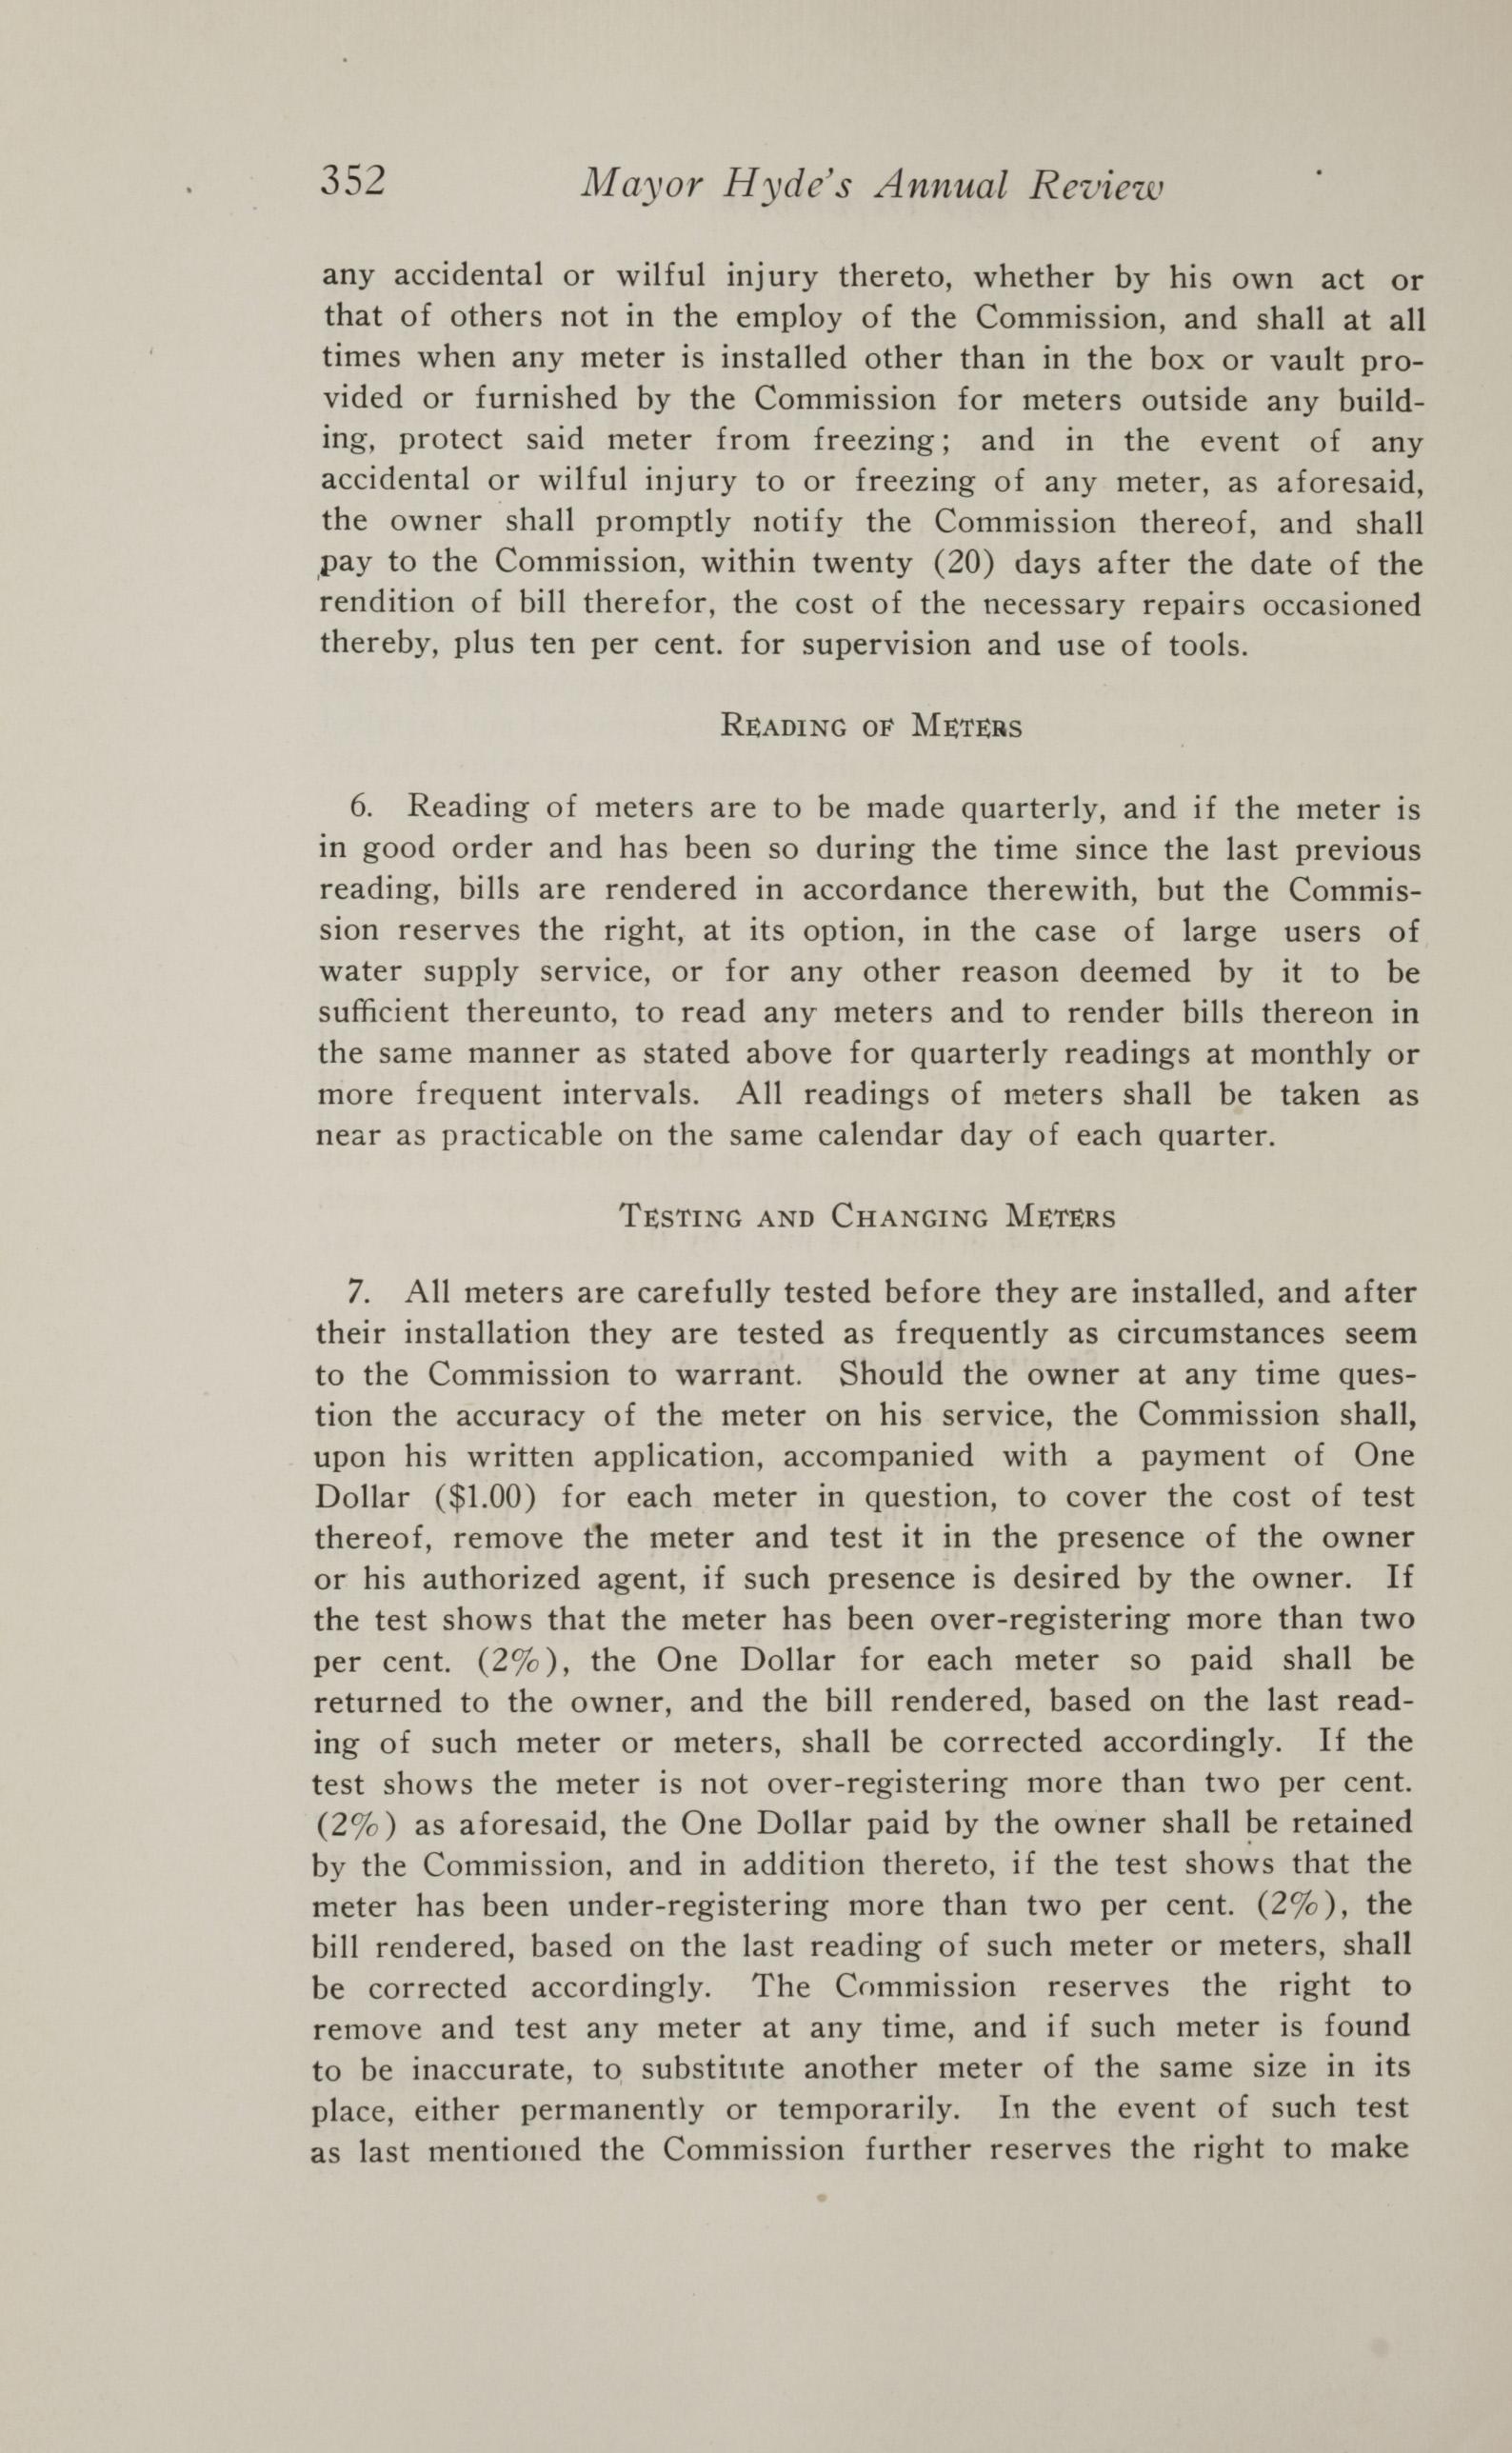 Charleston Yearbook, 1917, page 352